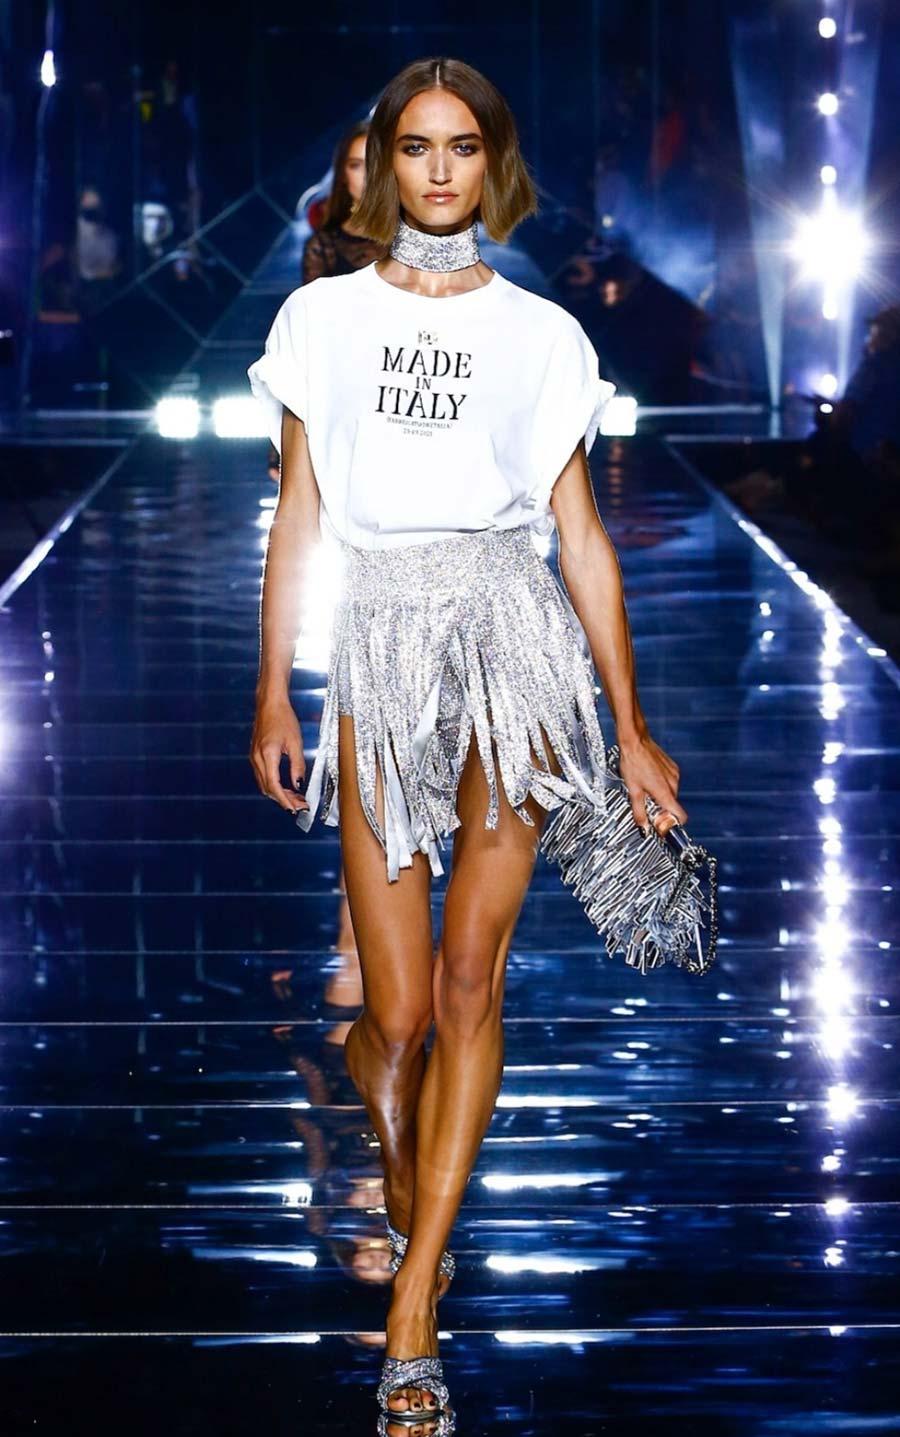 Made-In-Italy-Dolce-&-Gabbana